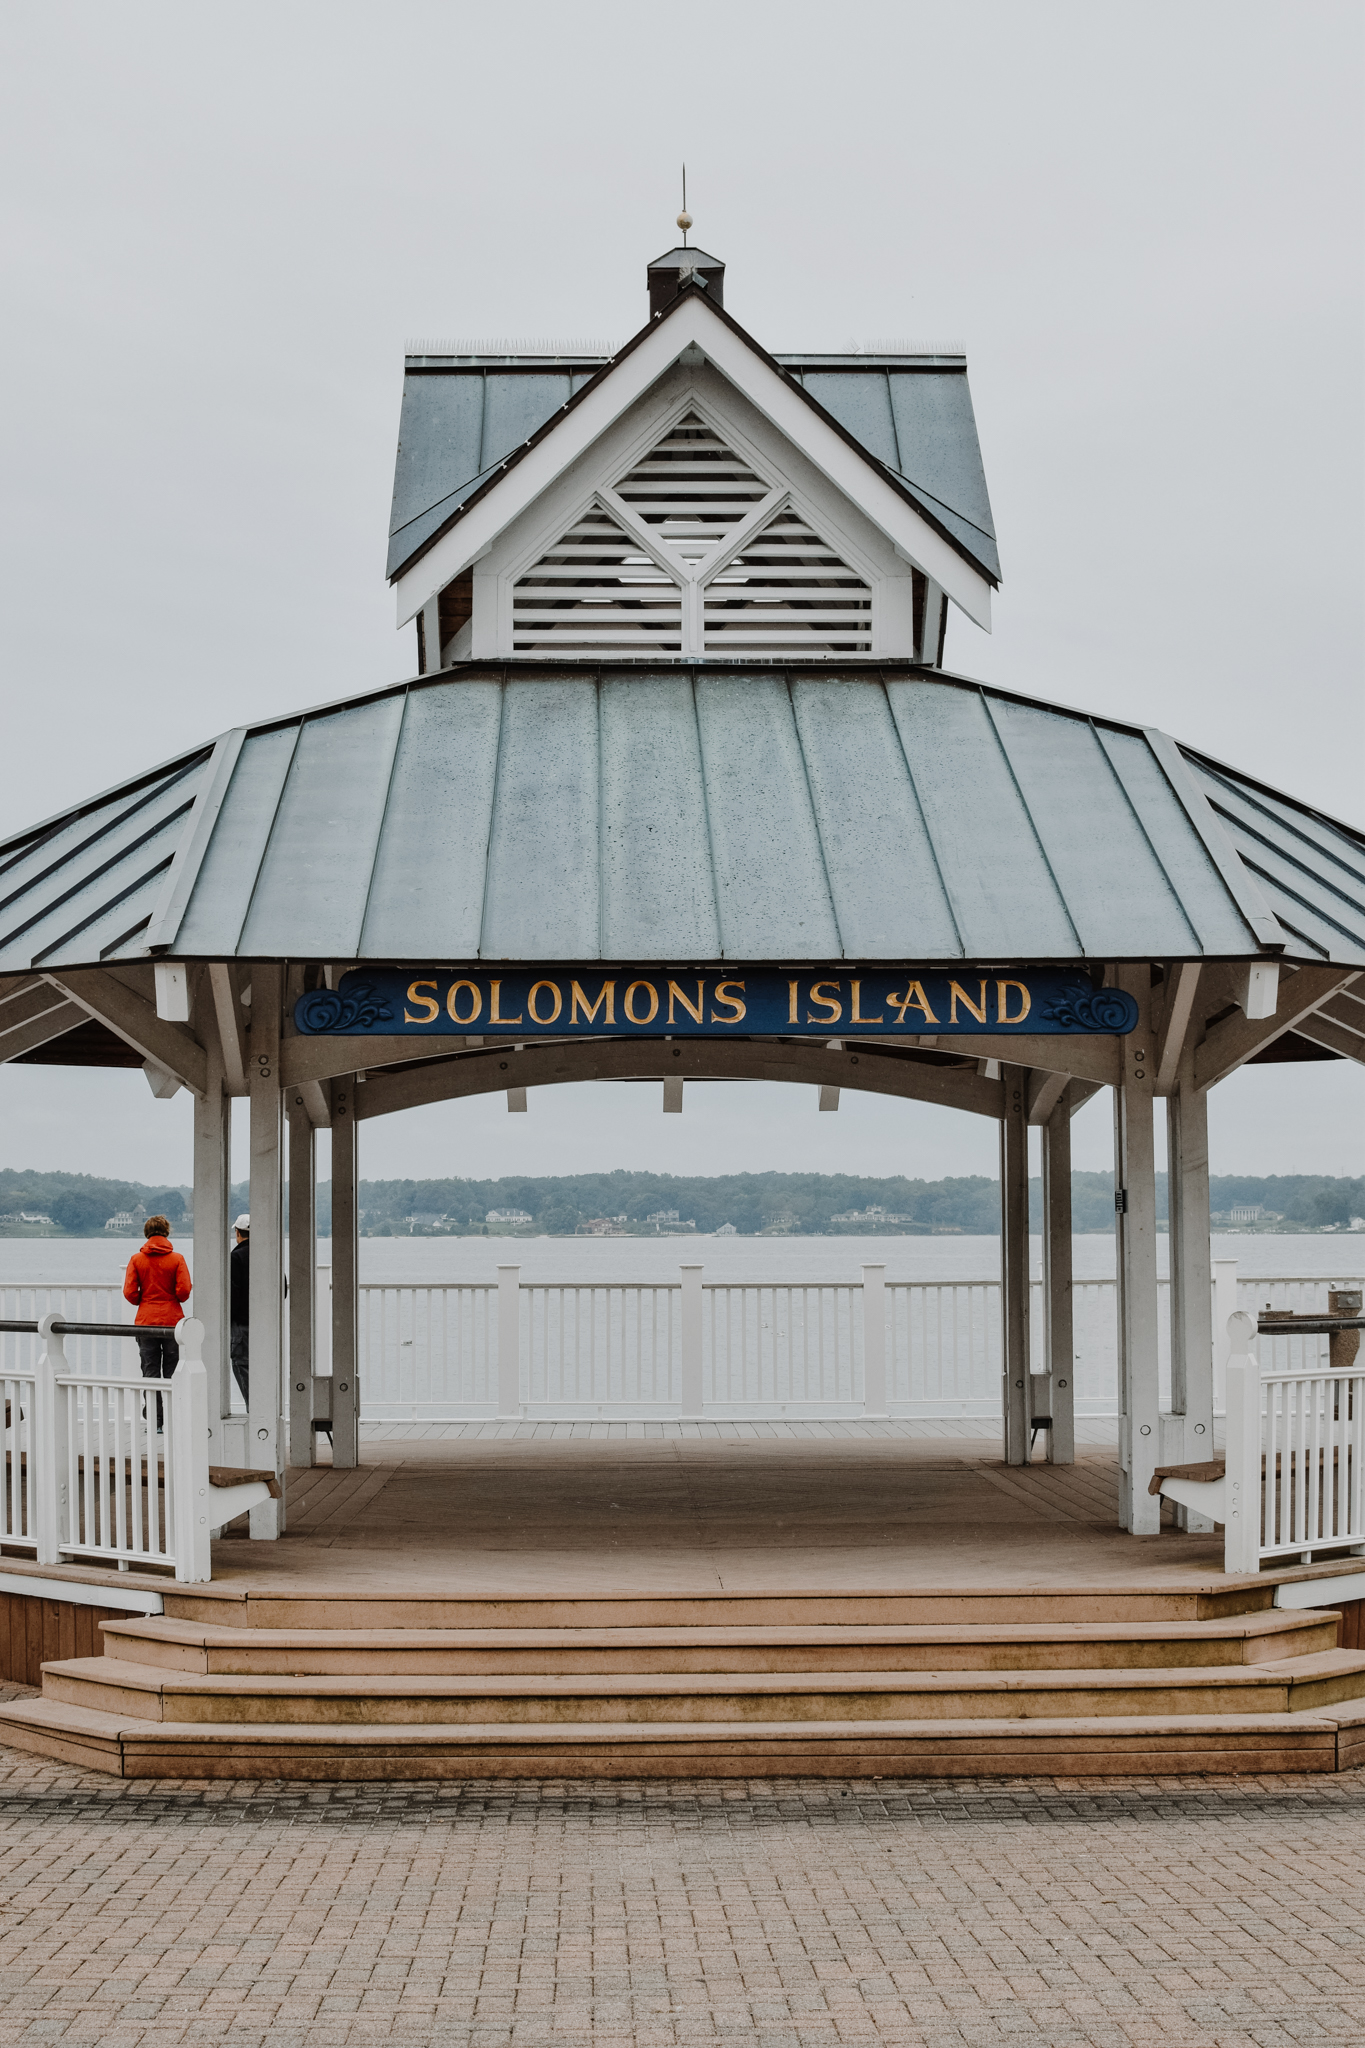 weekend in calvert county - weekend on solomons island